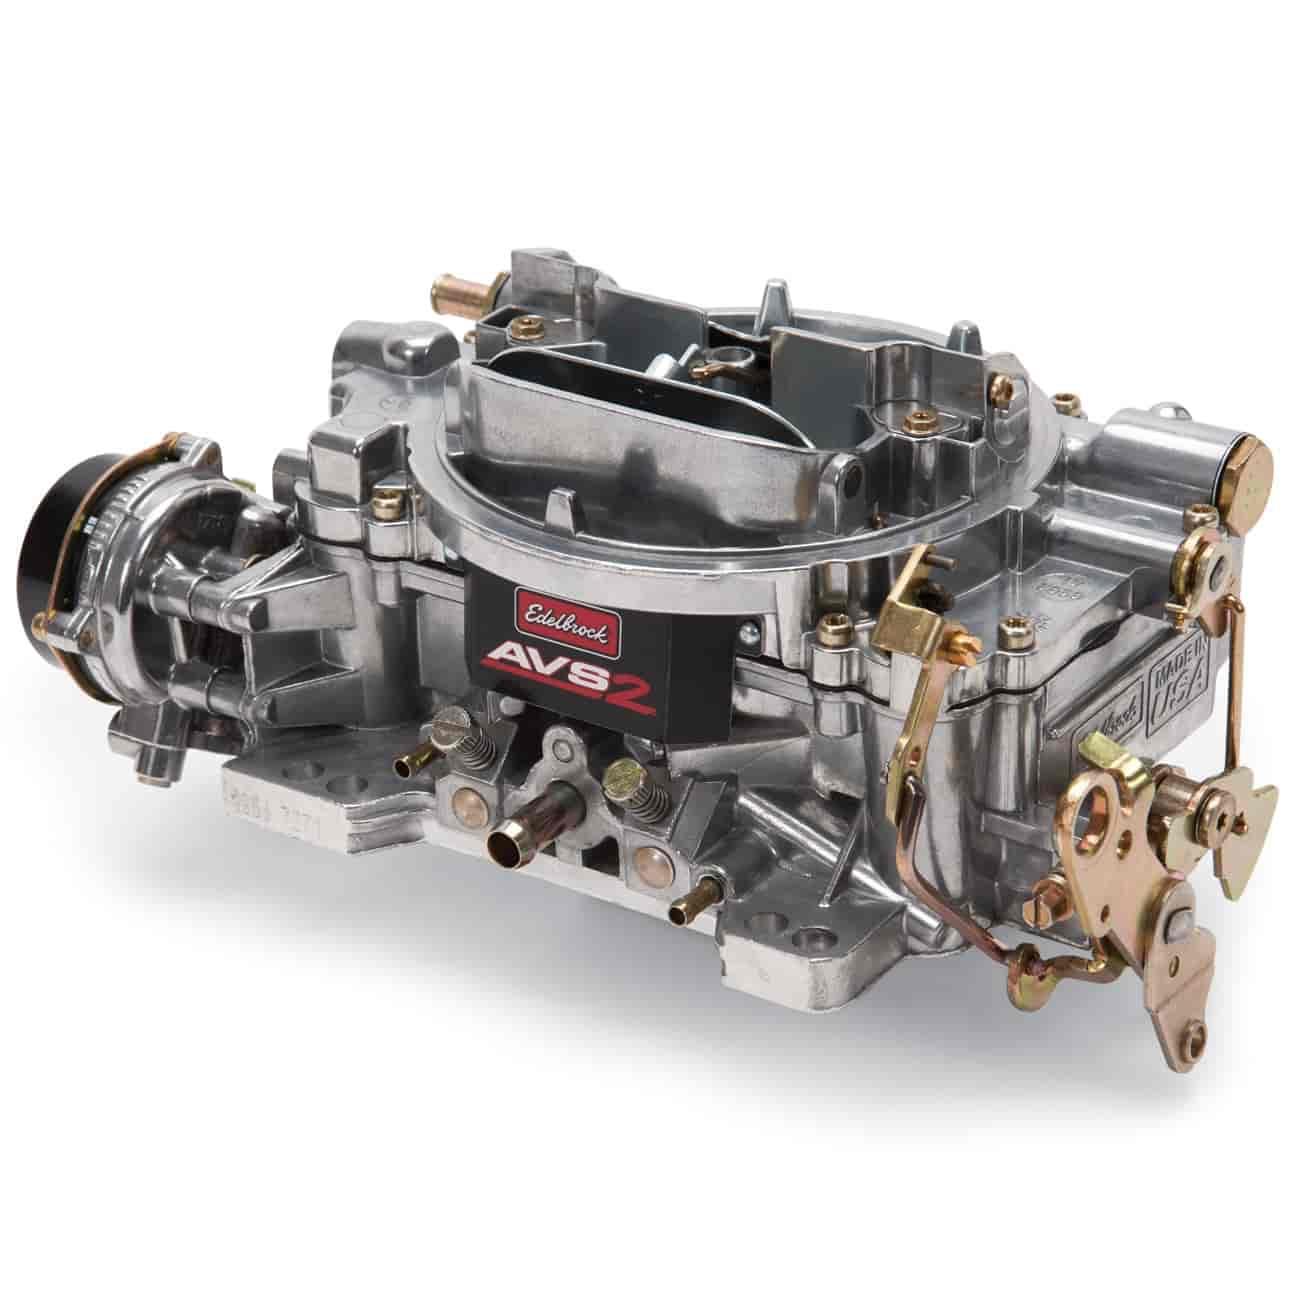 Edelbrock AVS2 500 CFM Carburetor